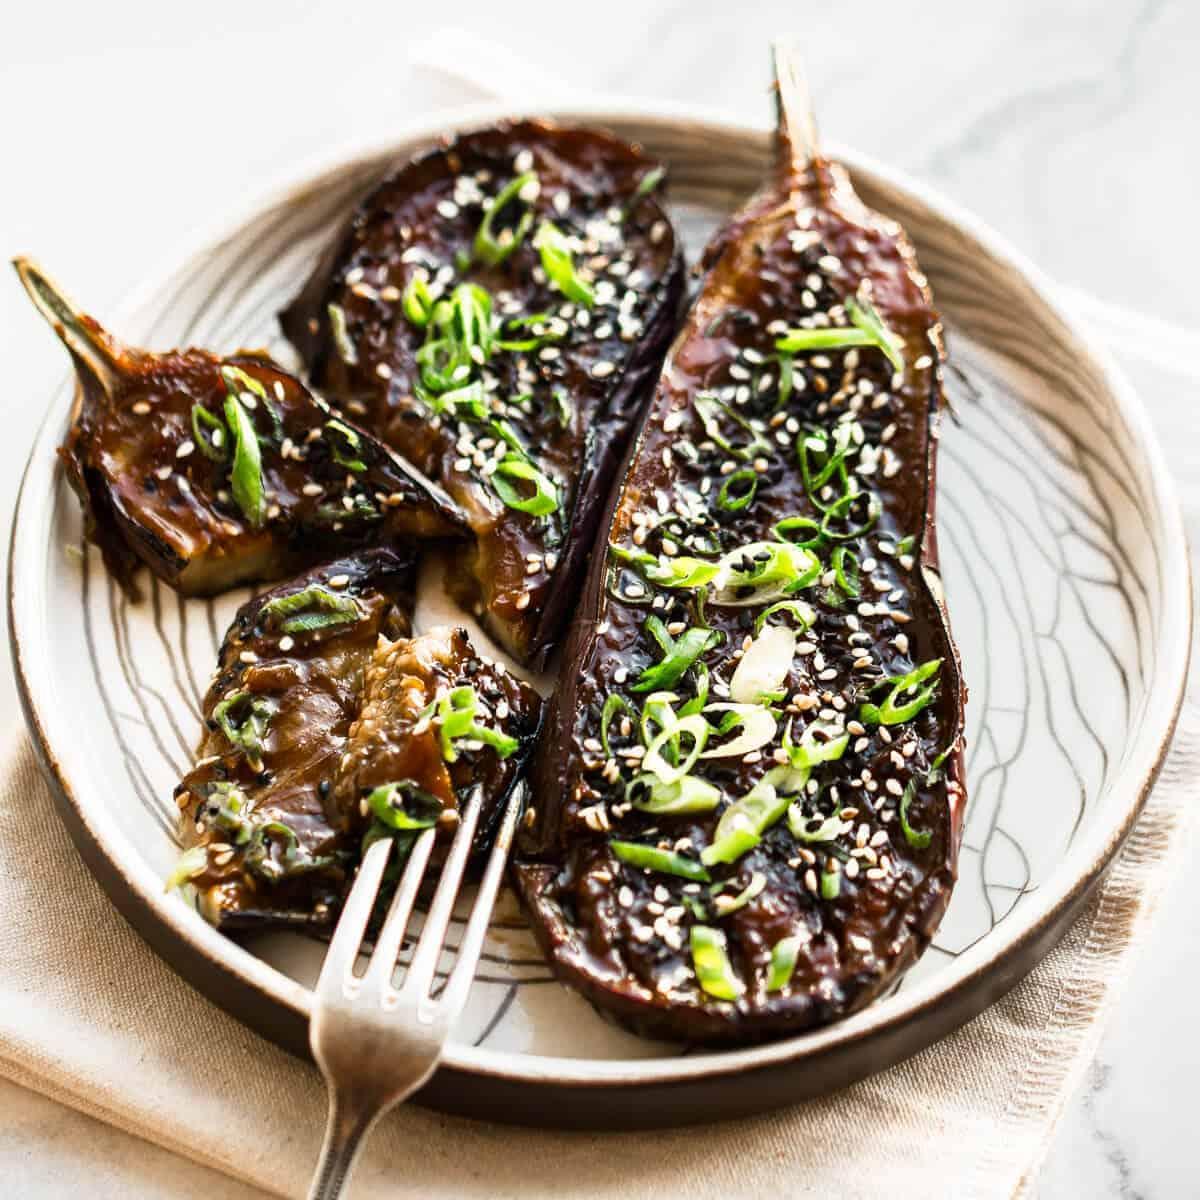 nasu dengaku - miso baked eggplant